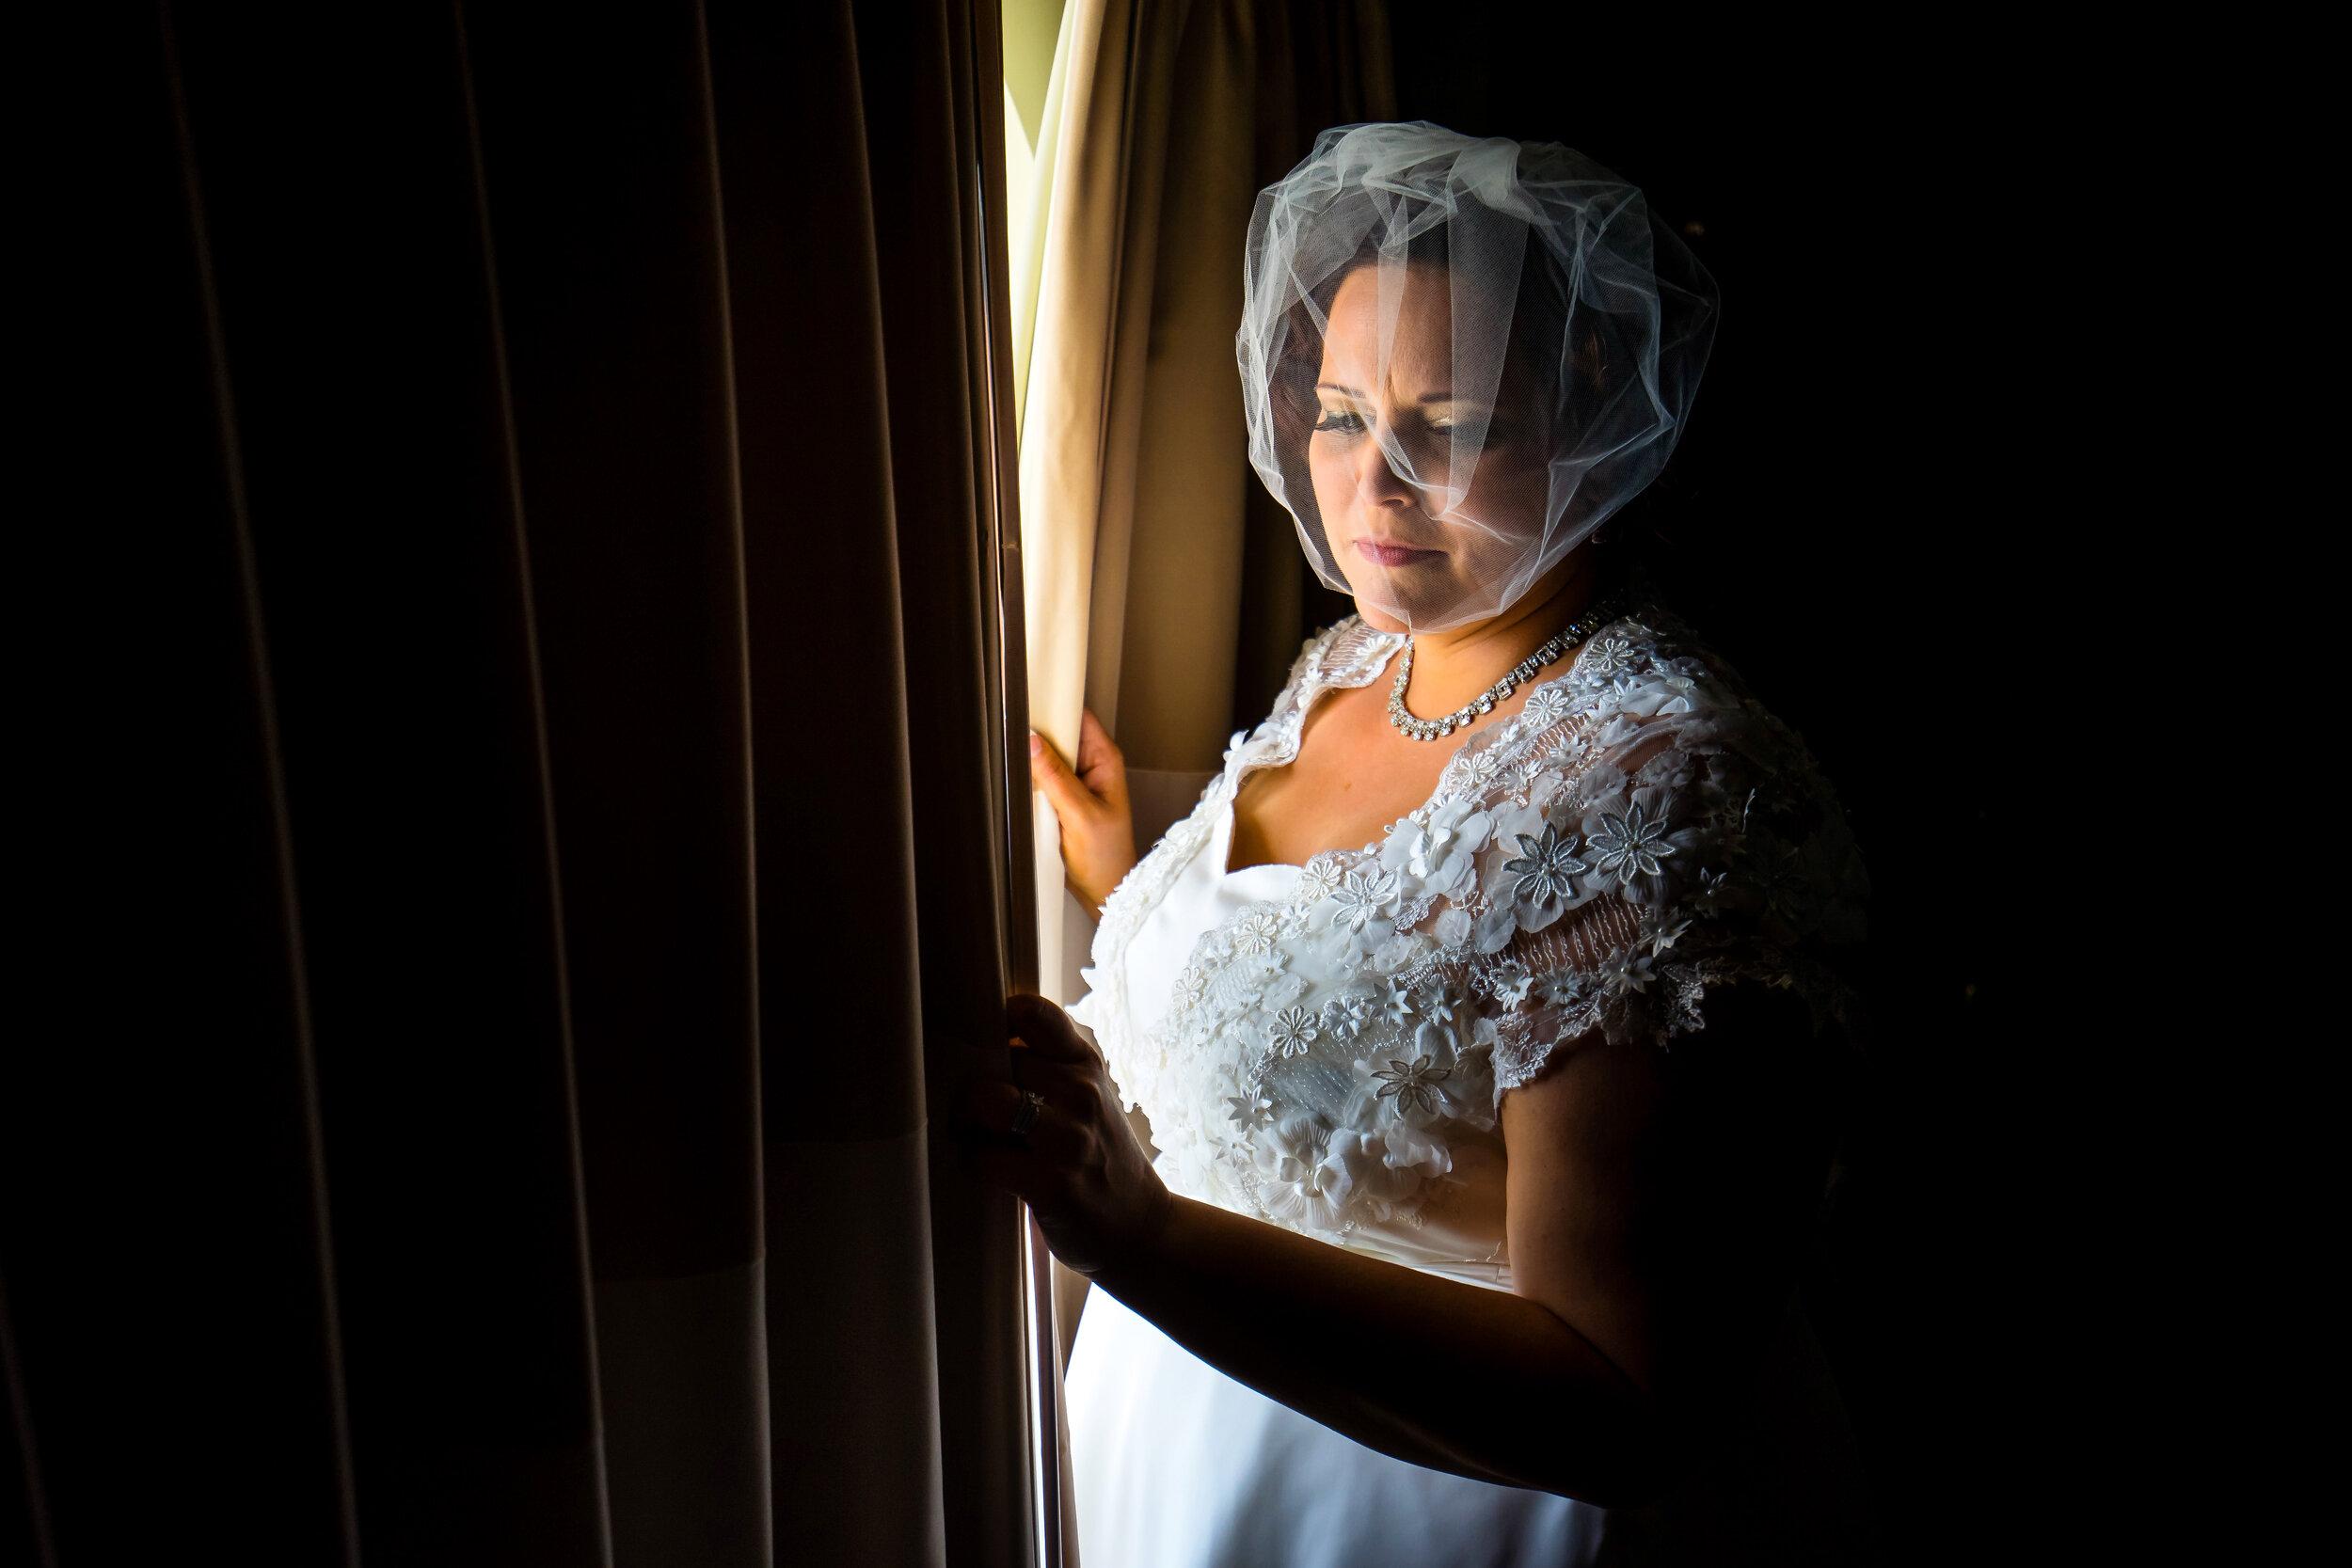 Vintage bride in bespoke wedding dress with net fascinator opening the curtain.jpg